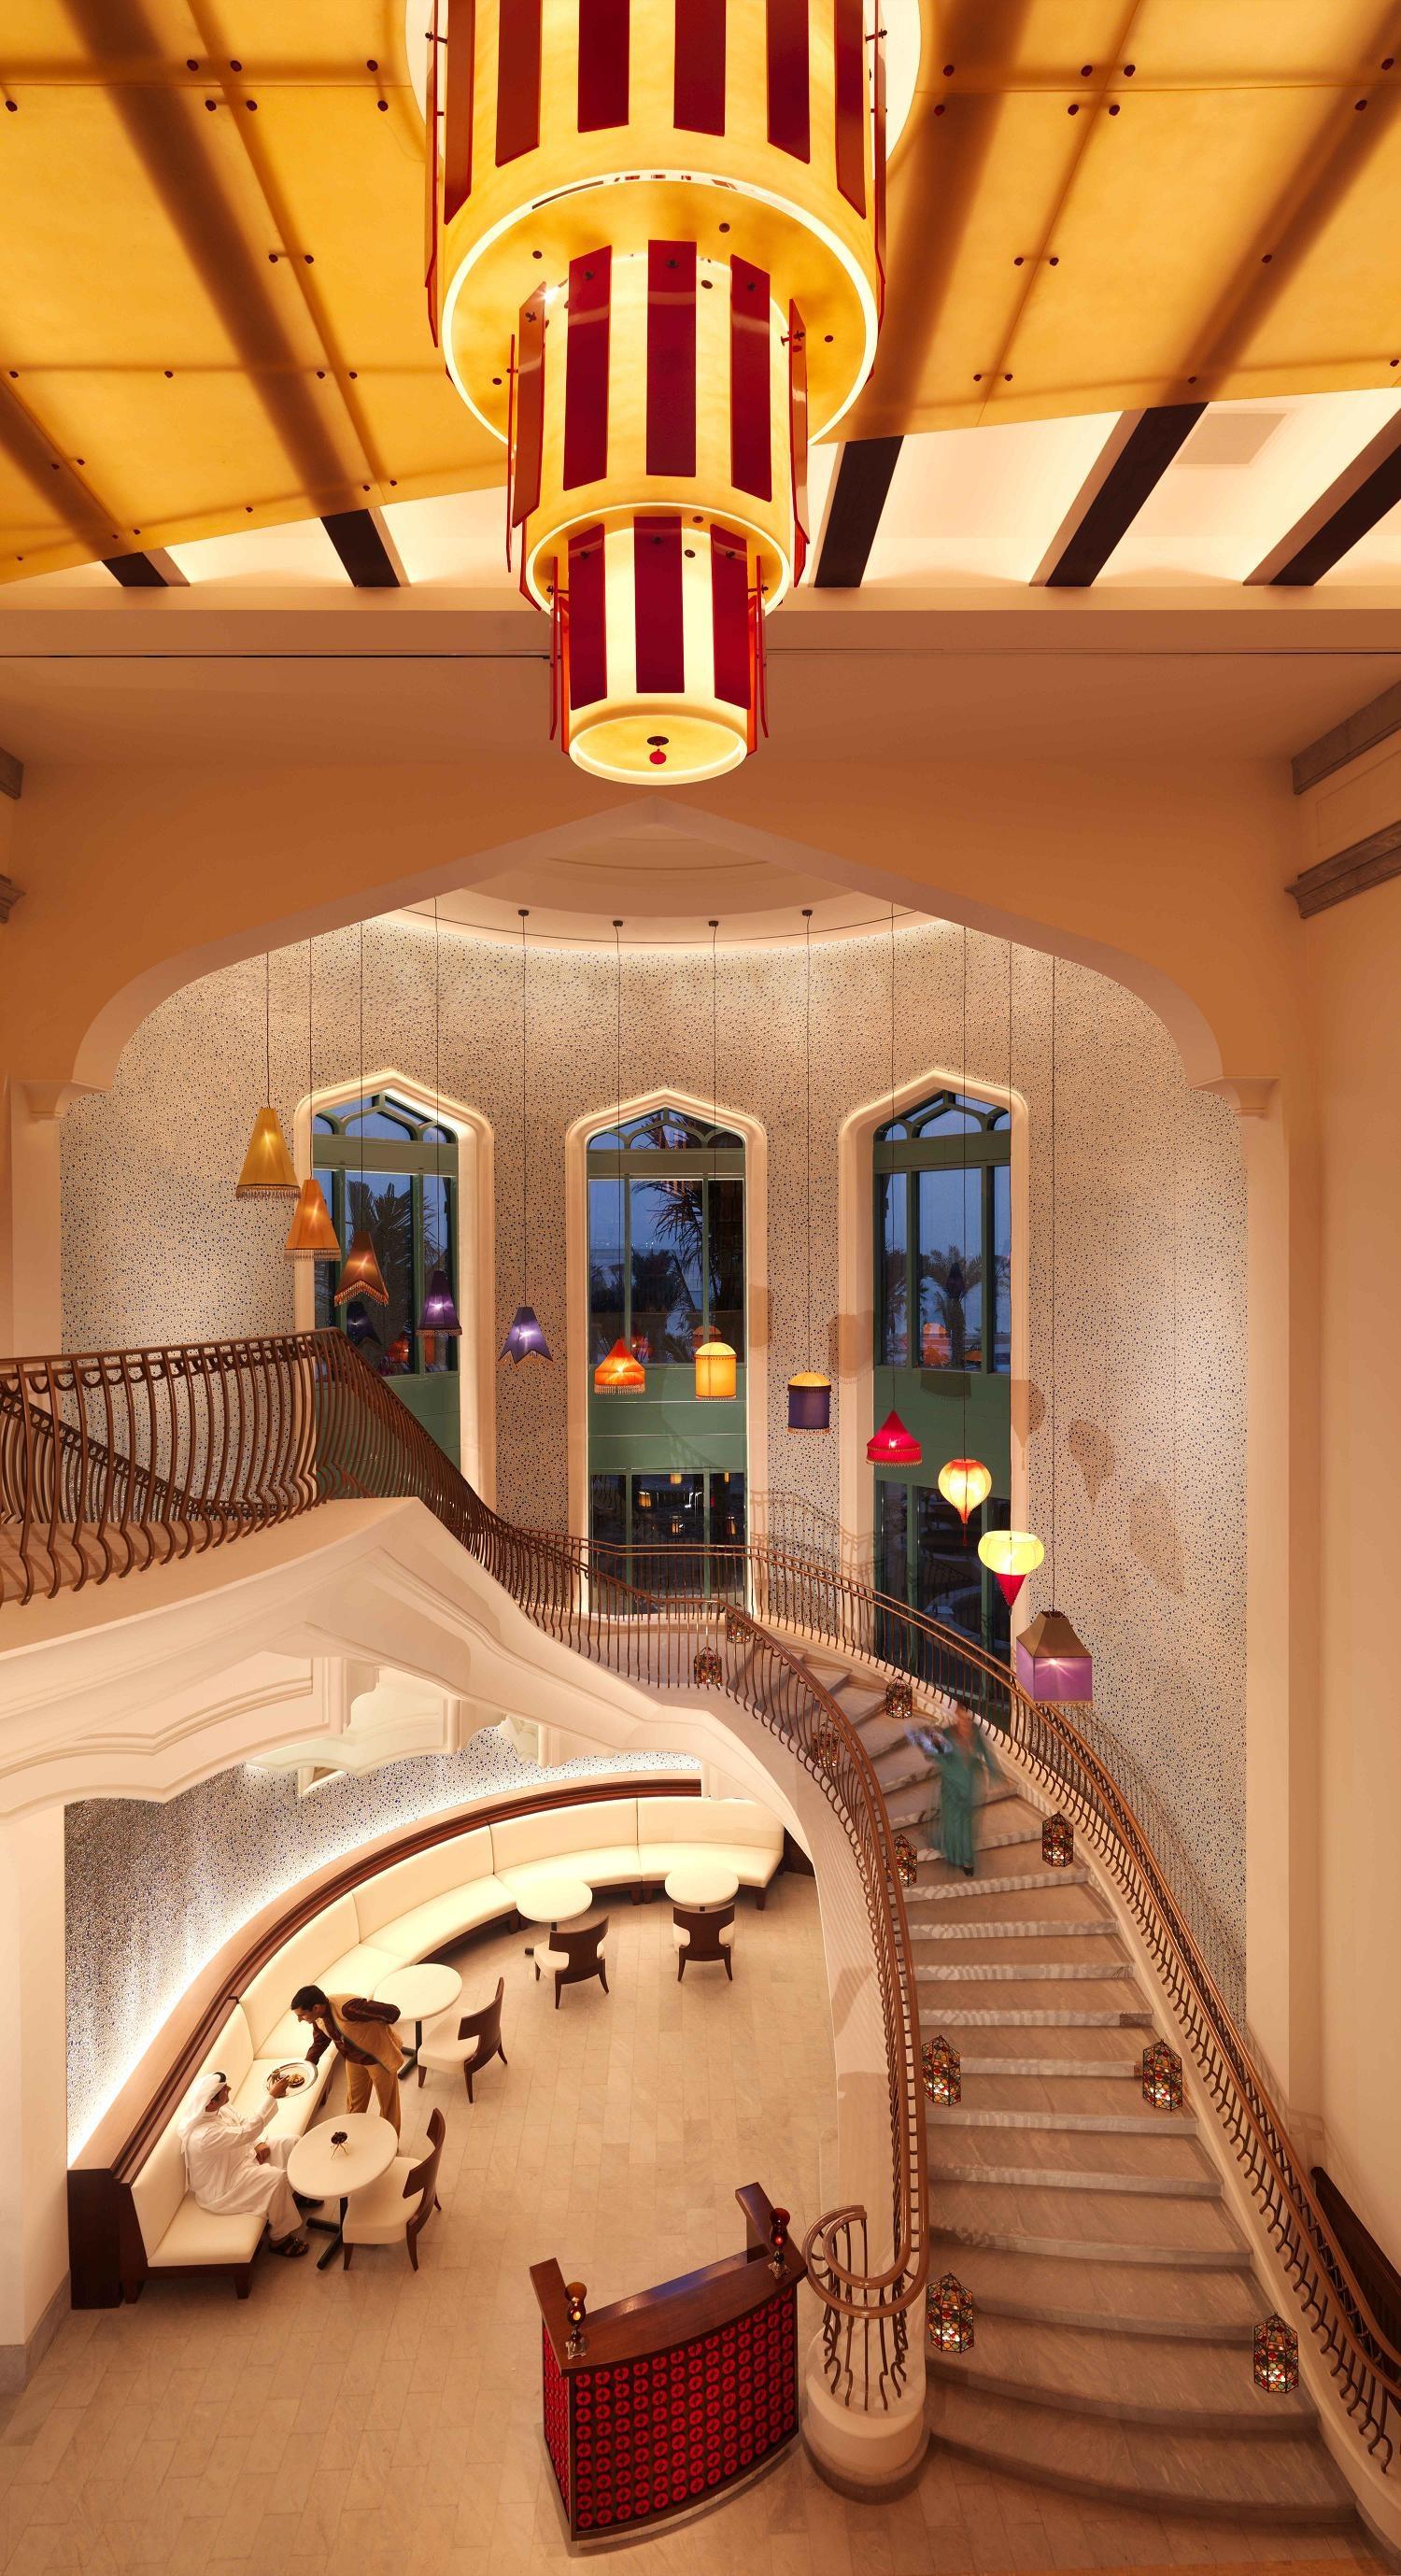 atlantis hotel dubai. Black Bedroom Furniture Sets. Home Design Ideas